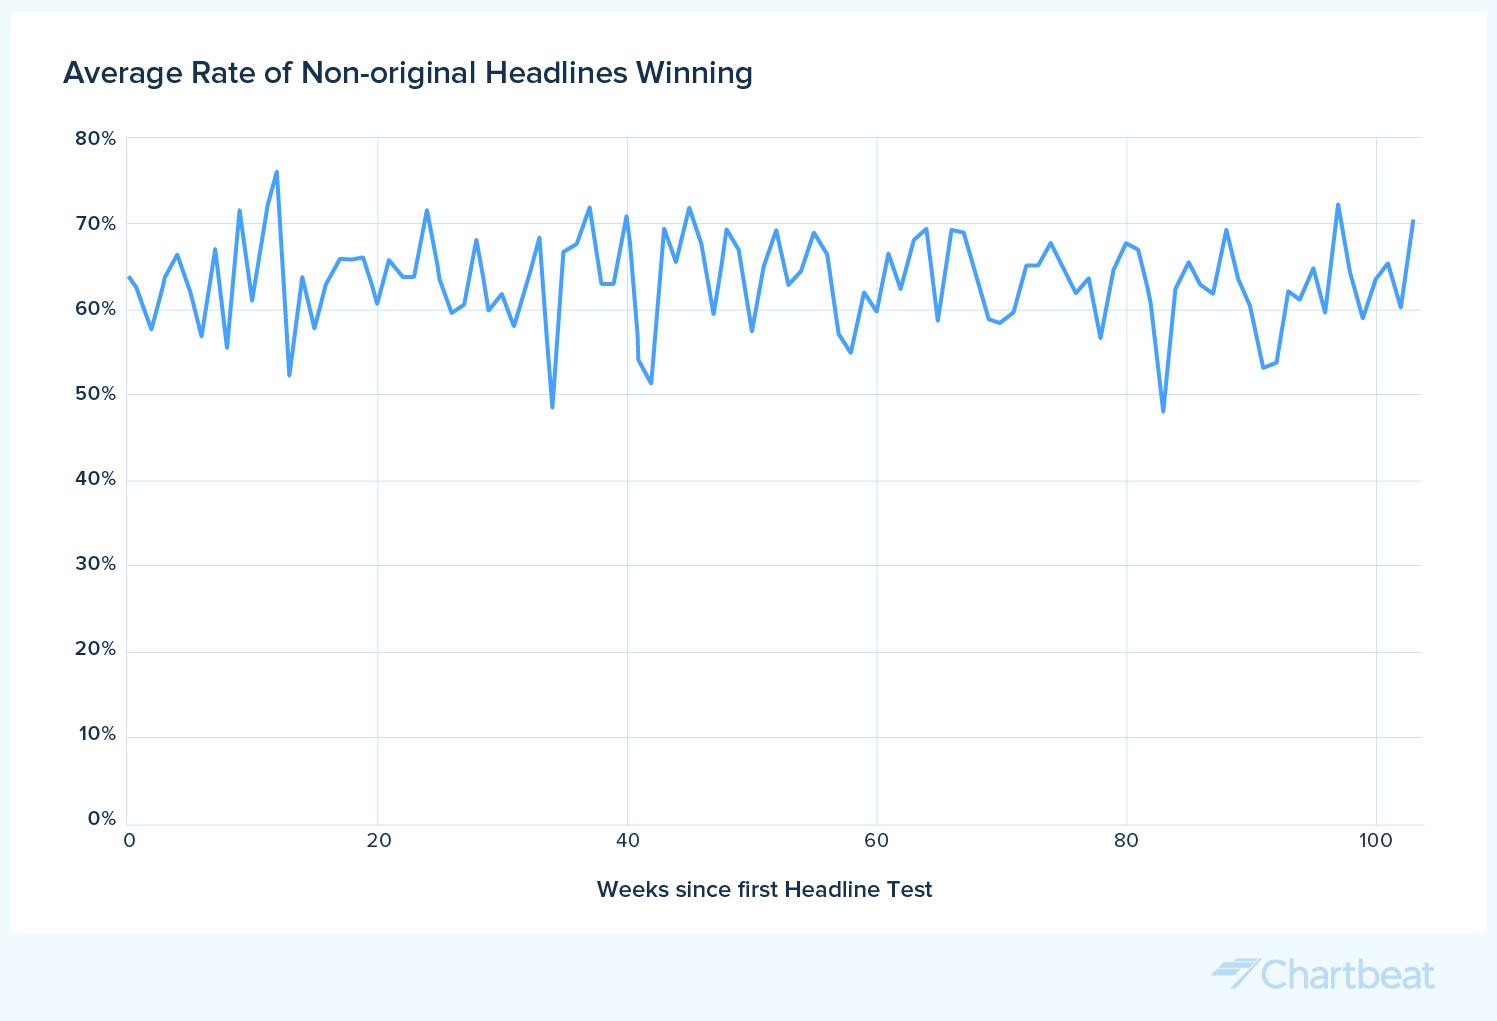 headline experimentation over time rate of non-original headlines